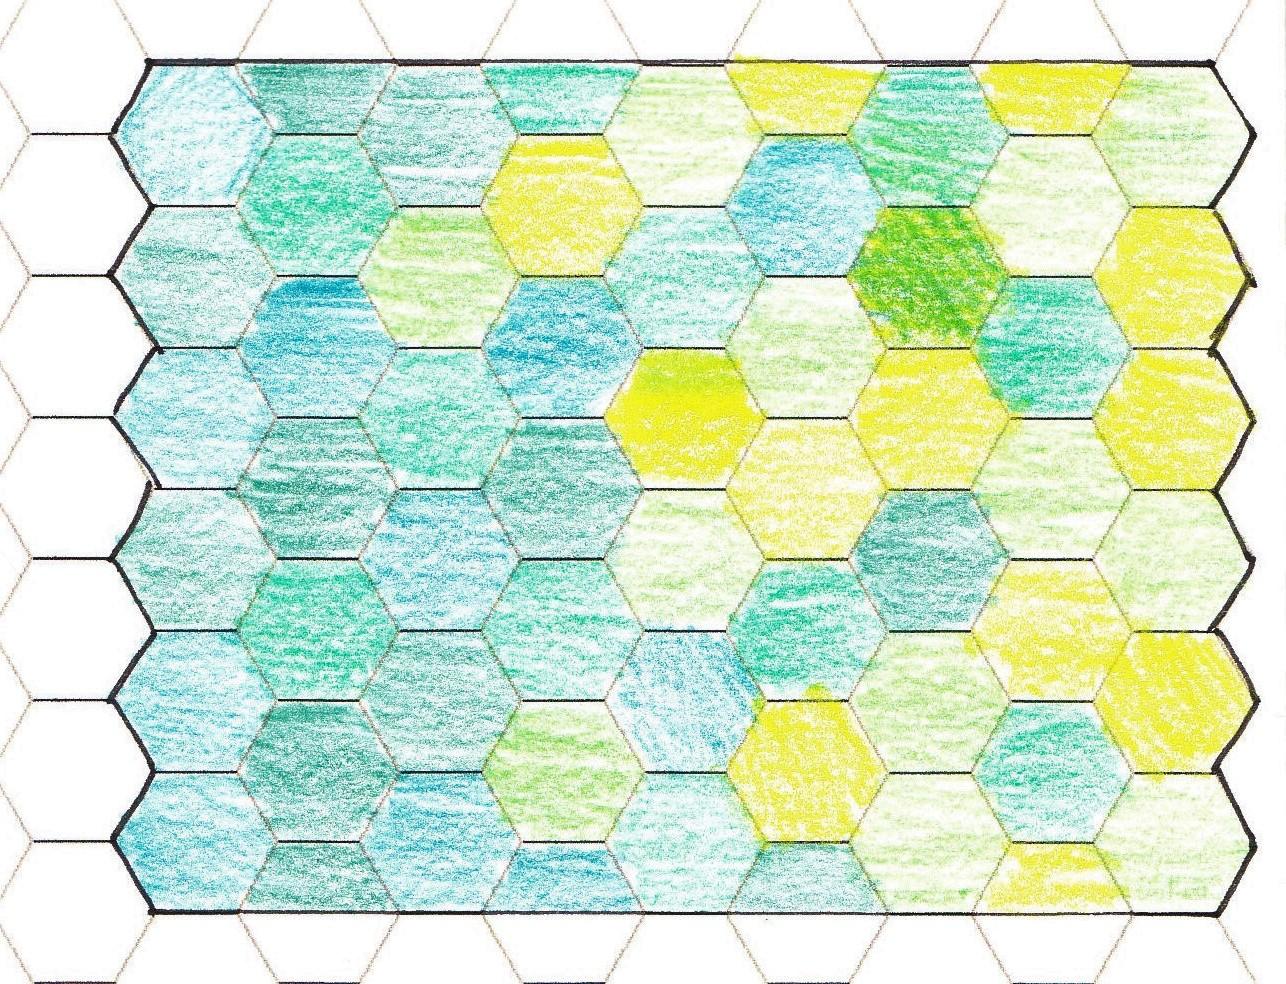 hexagon diagrams_0003 - Copy.jpg